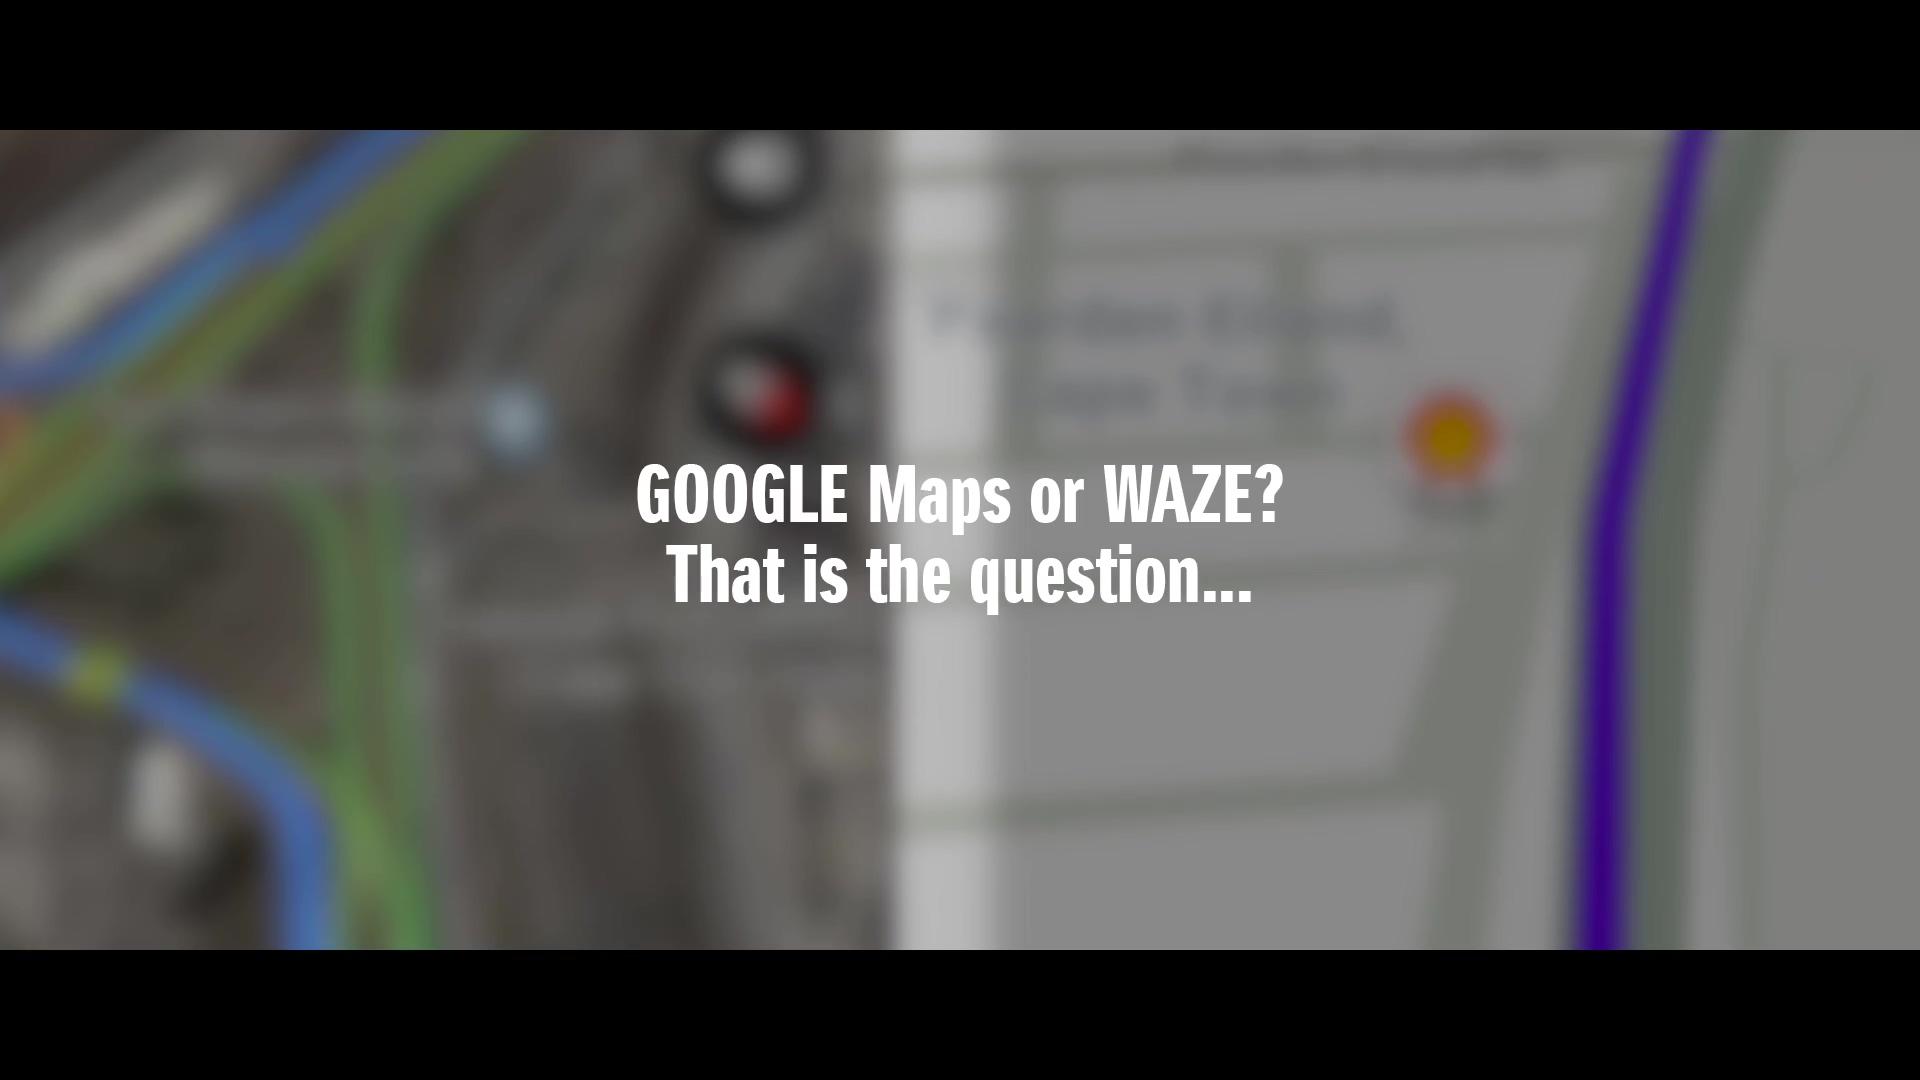 Real-time road test: Waze vs Google Maps